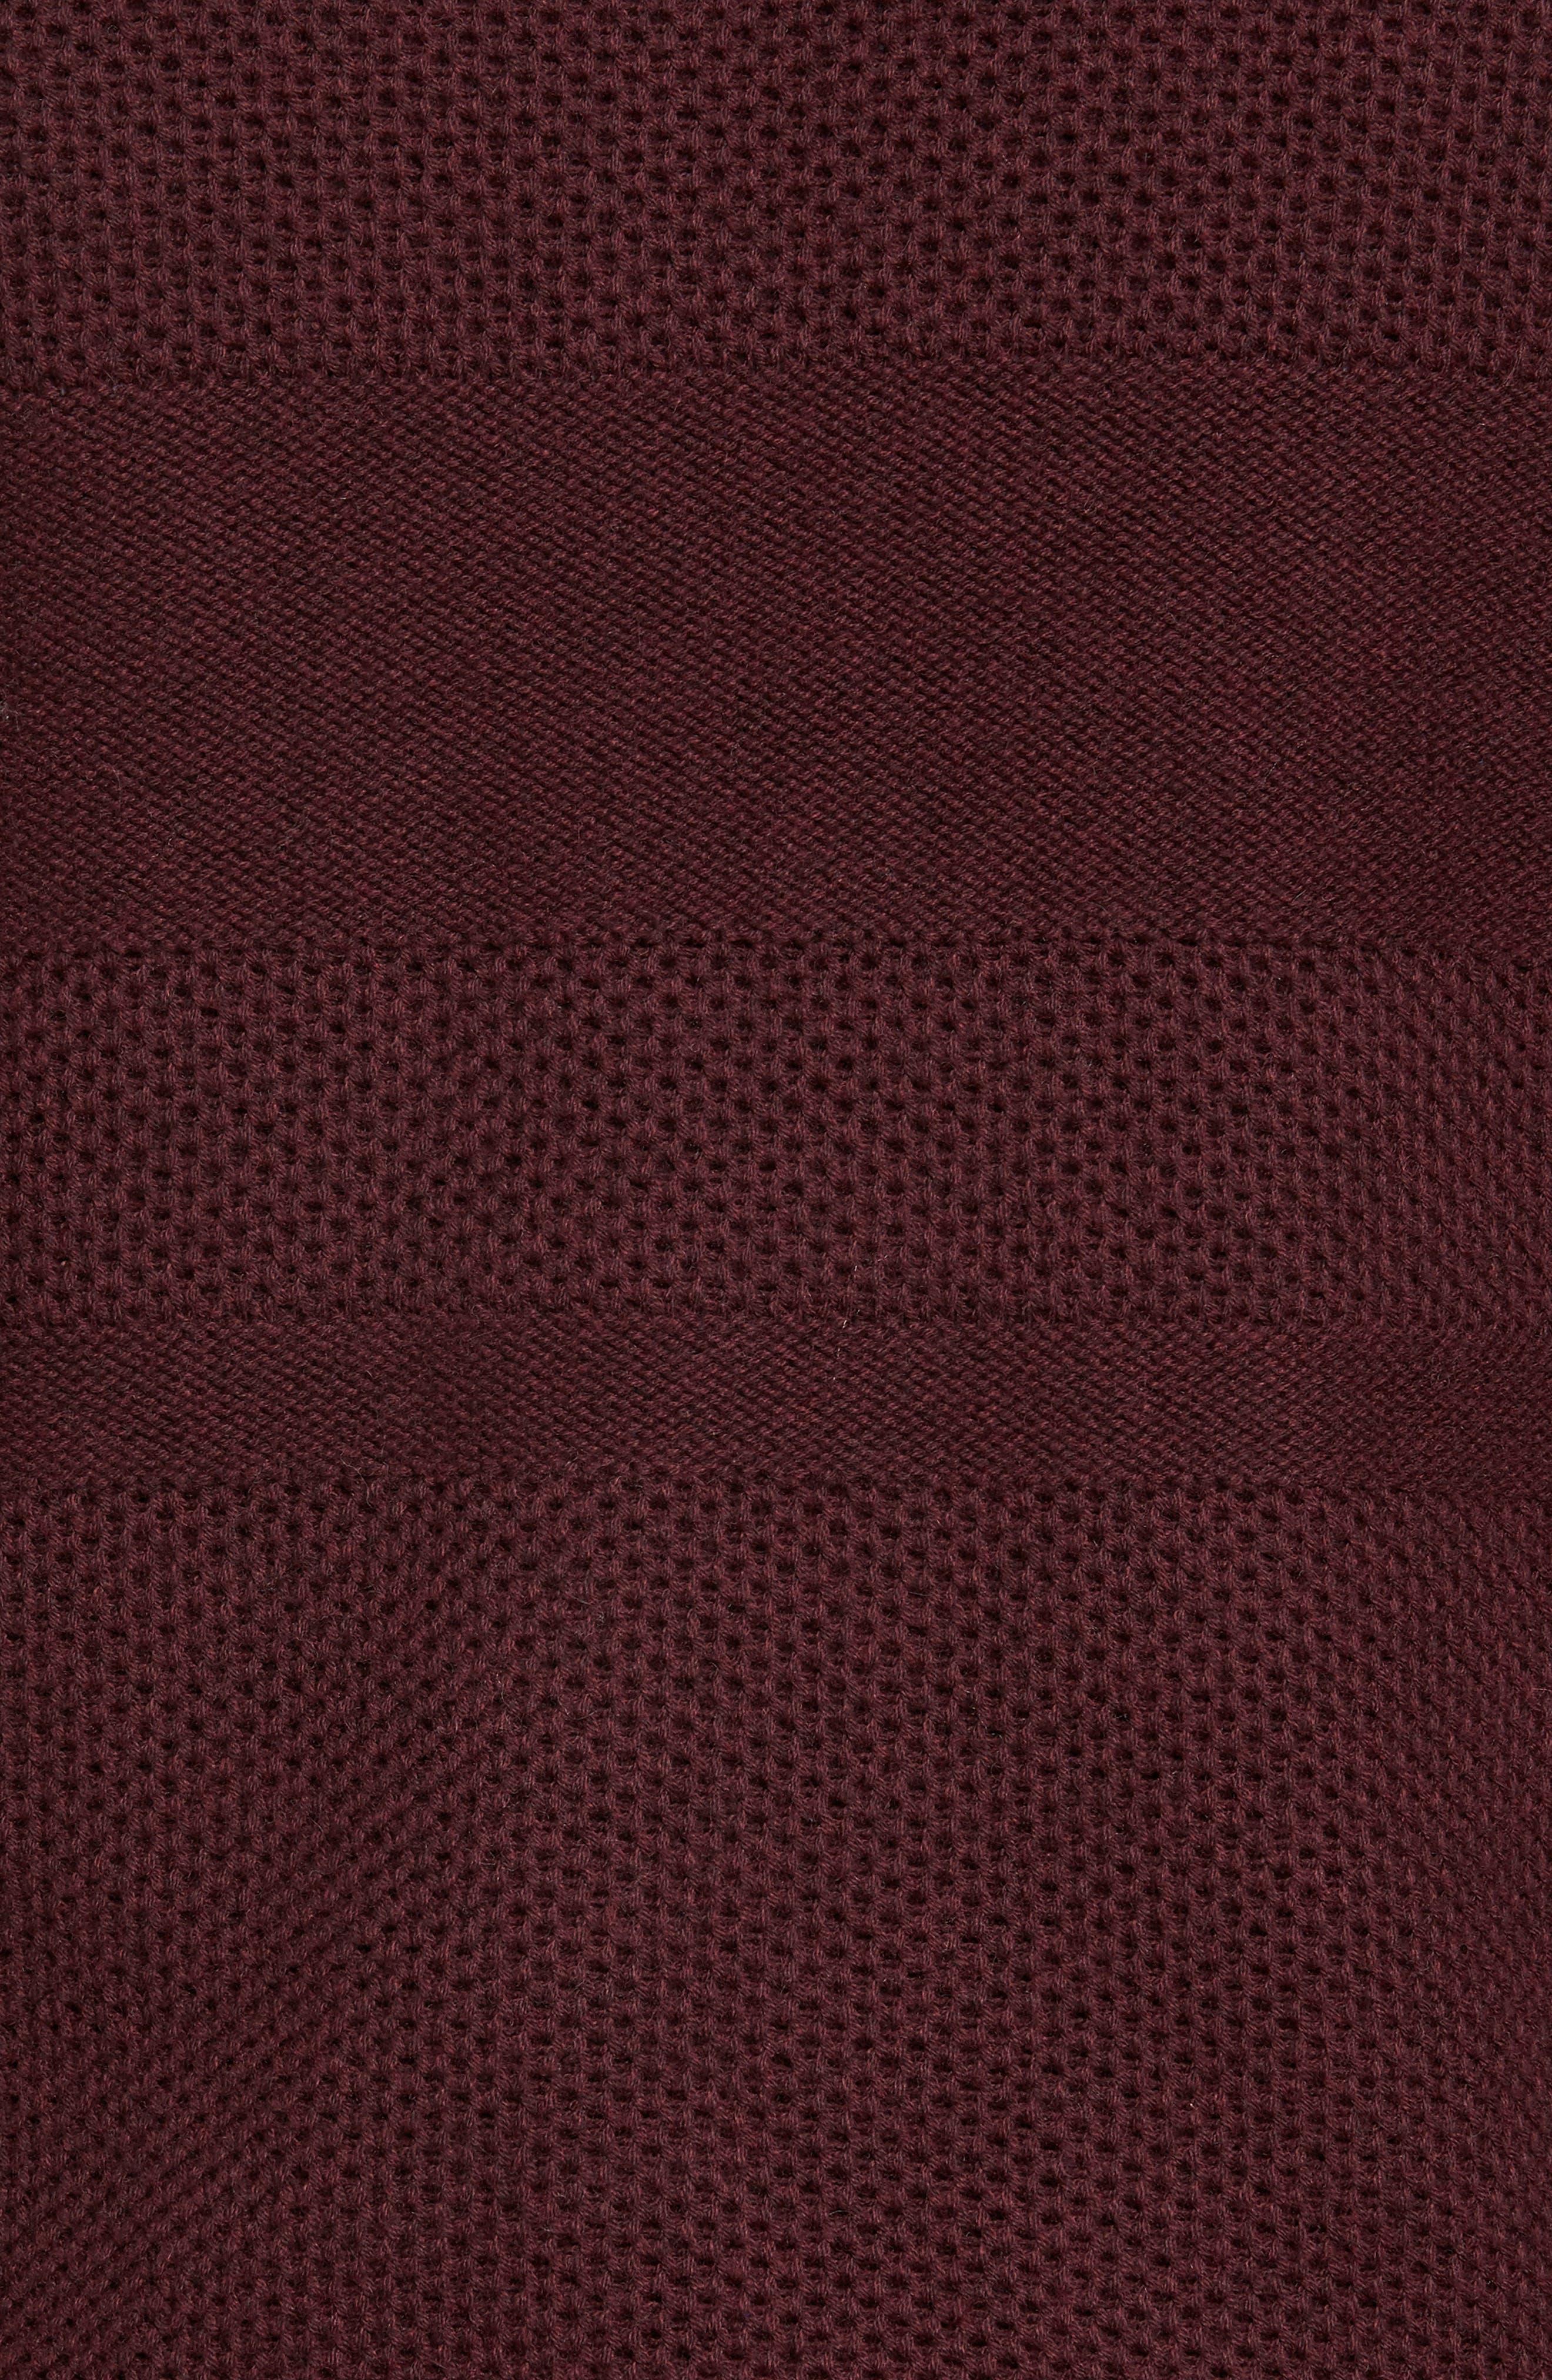 Alternate Image 5  - Nordstrom Men's Shop Texture Cotton & Cashmere Quarter Zip Sweater (Regular & Tall)